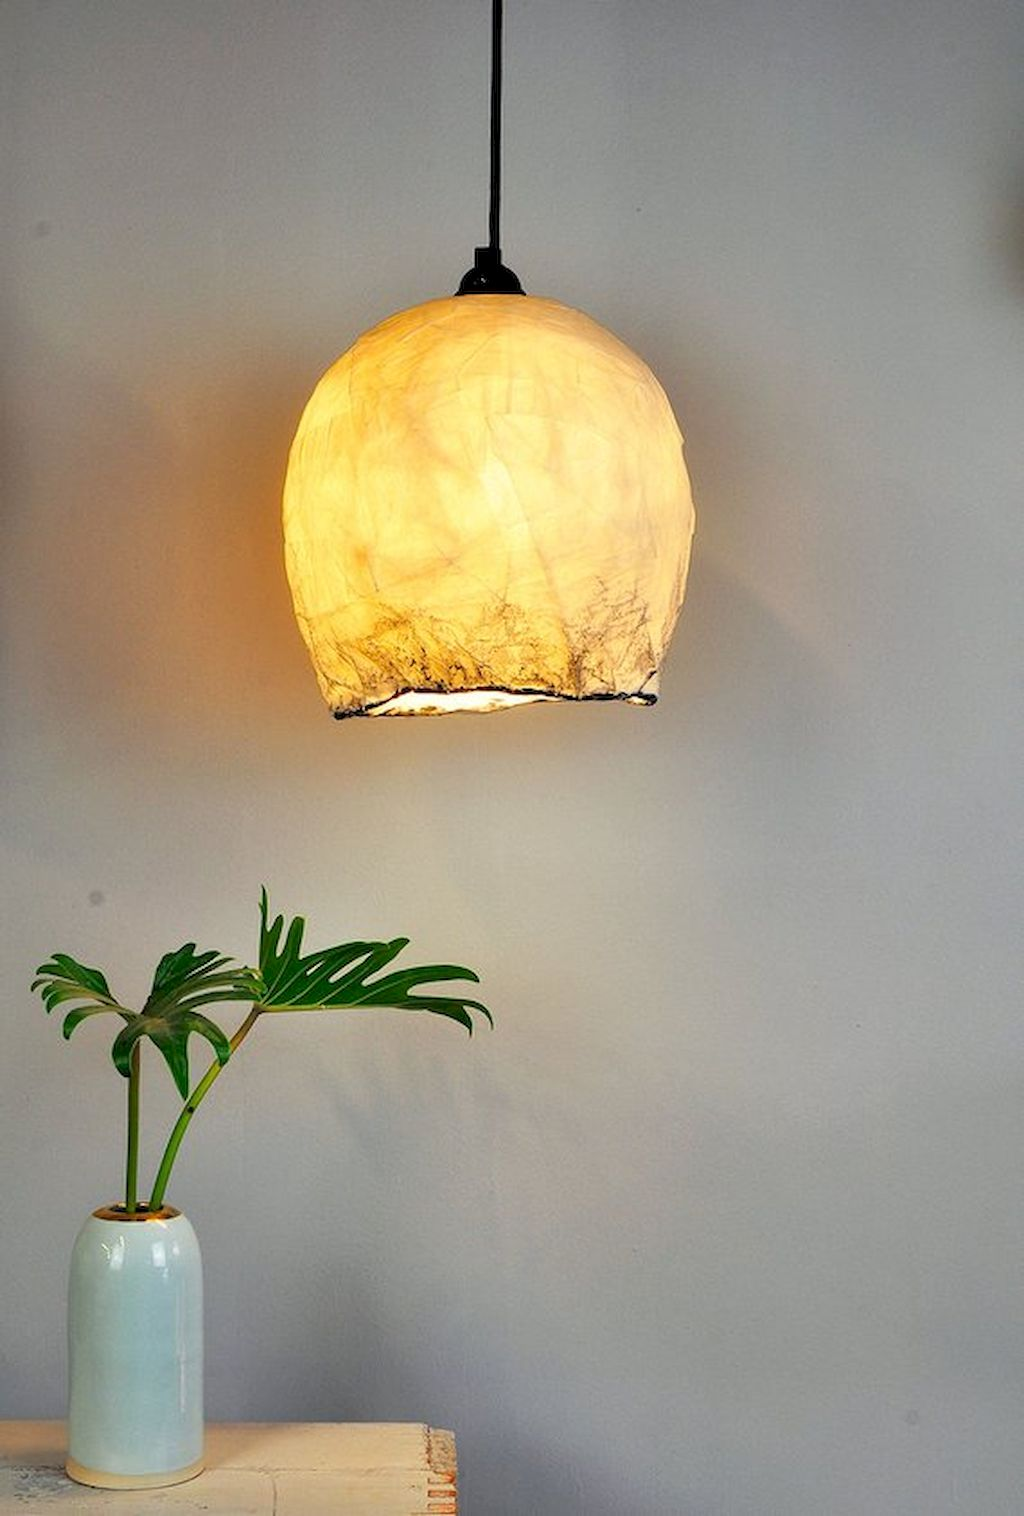 Ceiling Lamp143